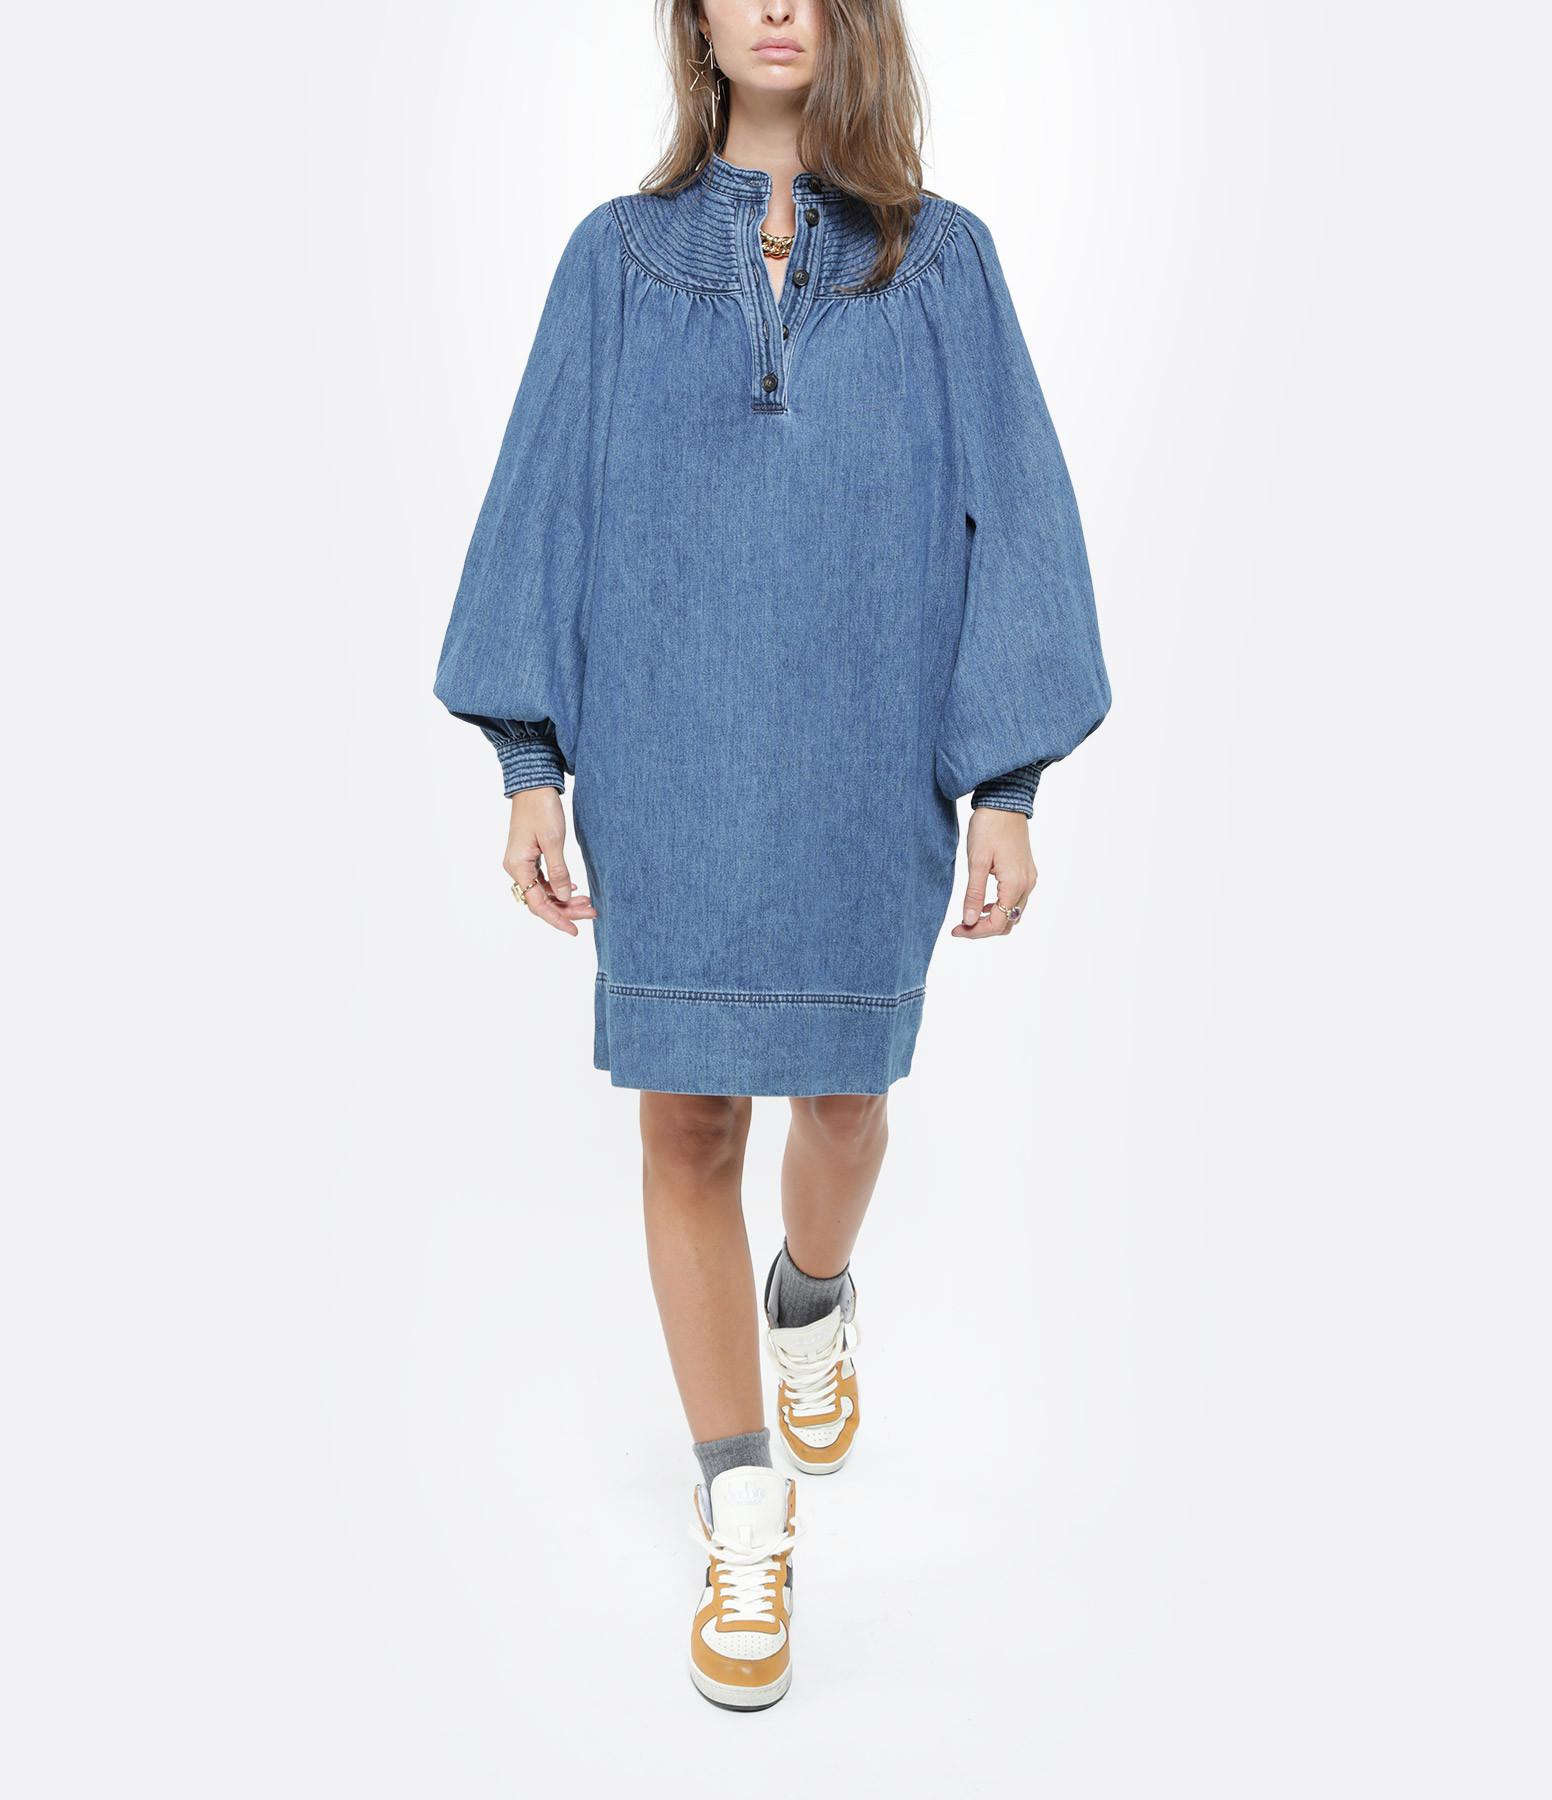 VANESSA BRUNO - Robe Prissie Indigo